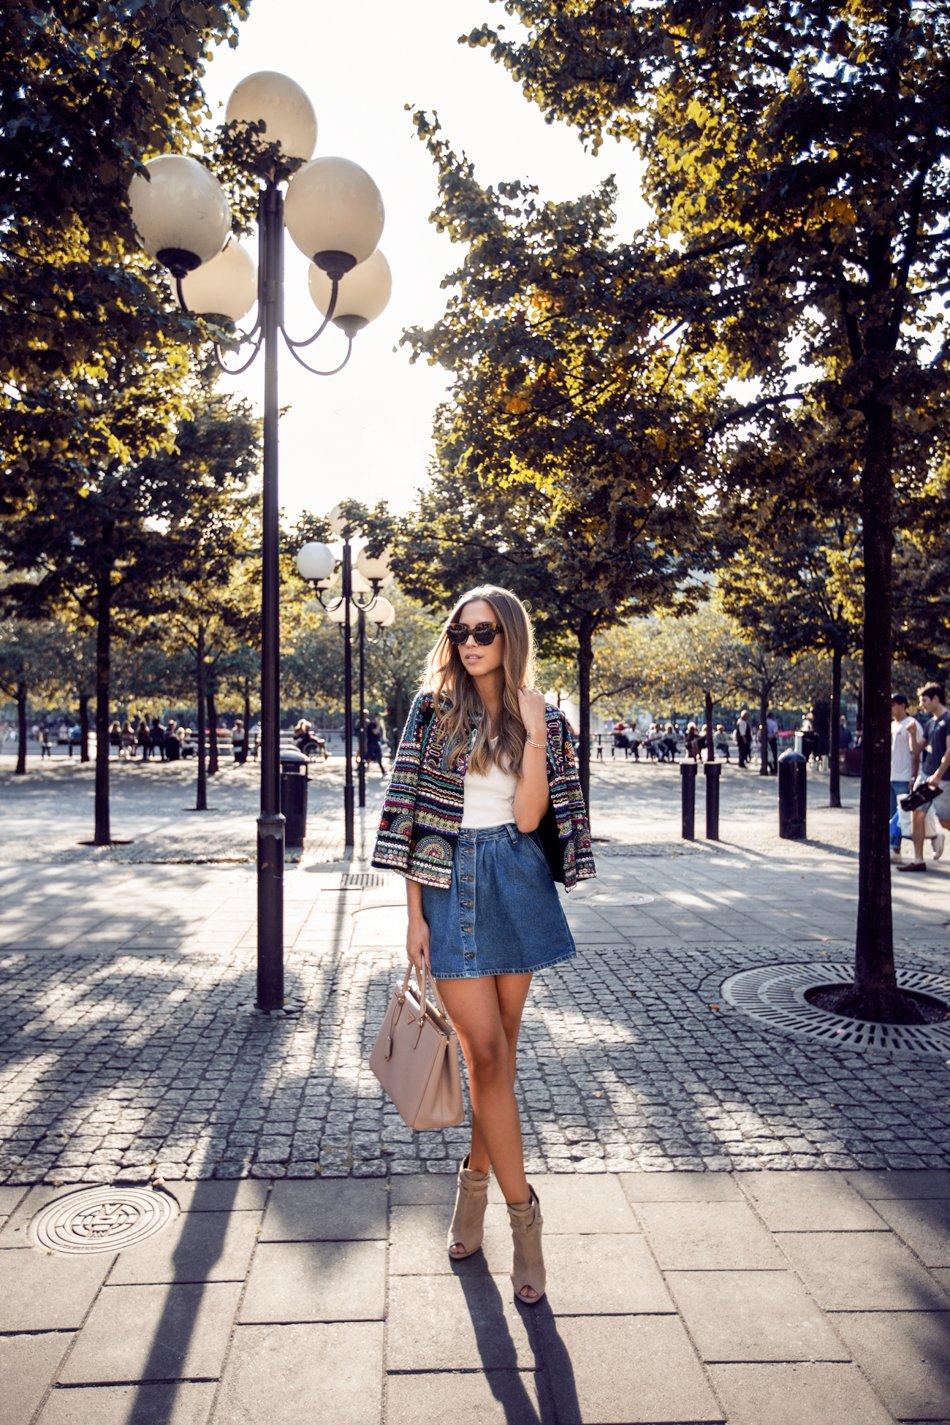 KenzaZouiten_fwday2_outfit_st-2